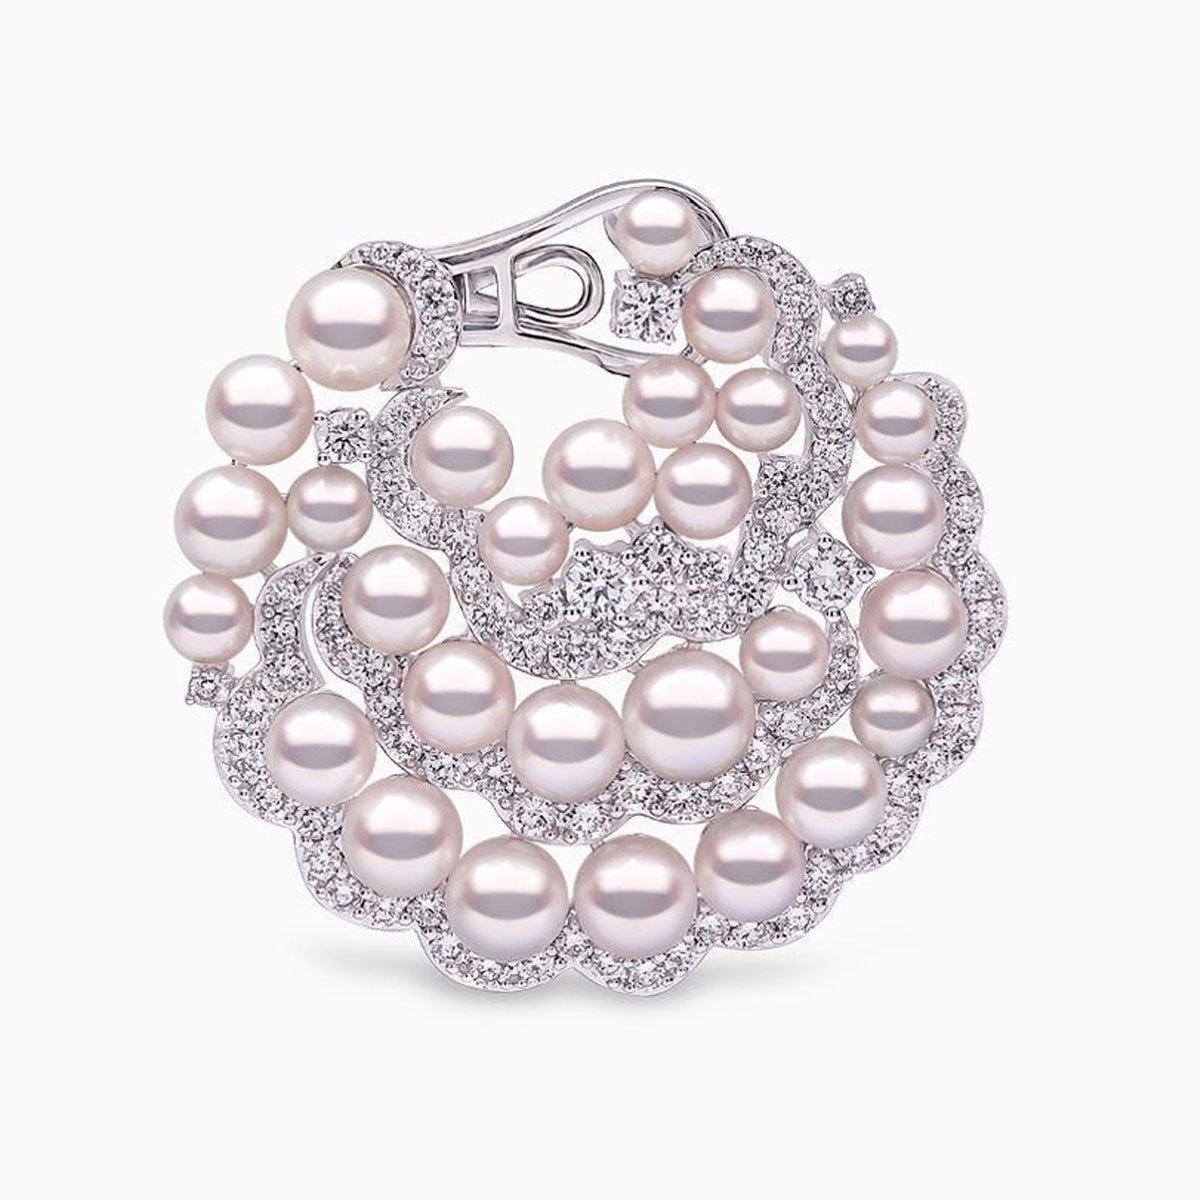 0002579 raindrop akoya pearl and diamond earrings in 18ct white gold 01